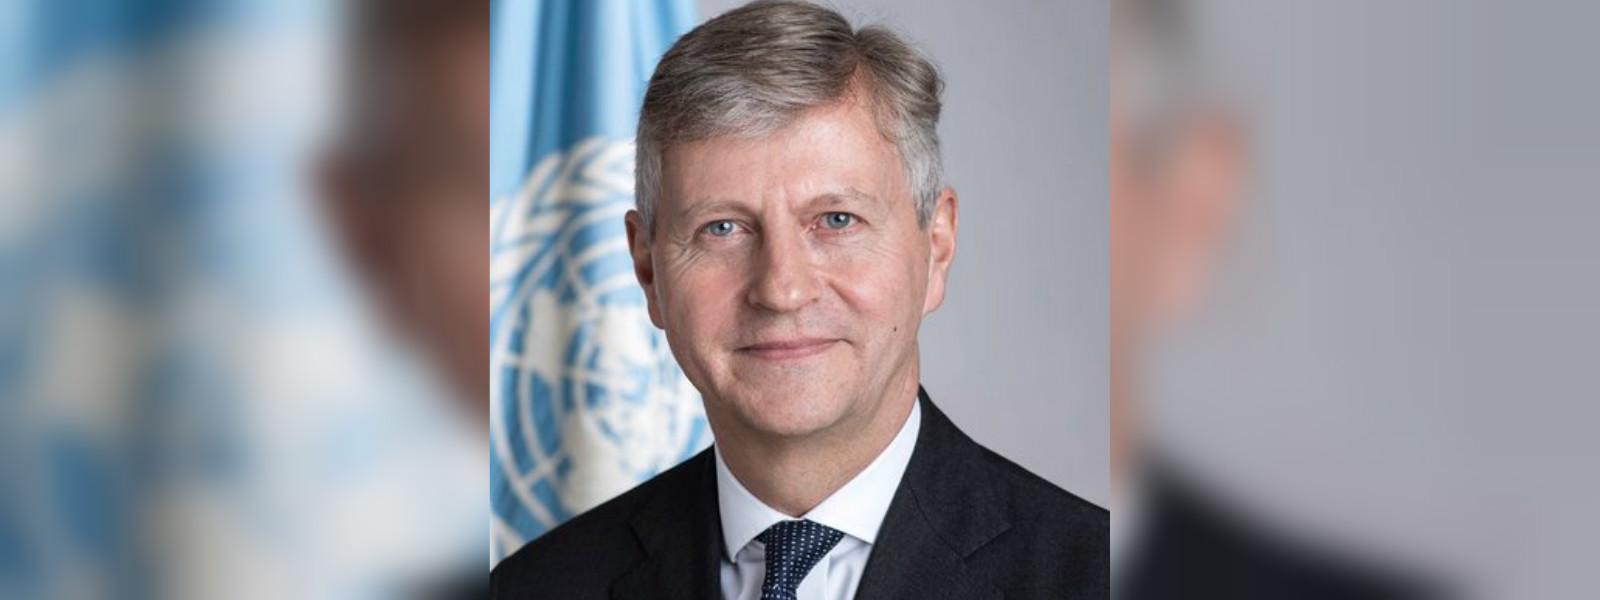 Sri Lanka's UN delegation meets with Under Secretary-General of UNDPO Jean-Pierre Lacroix